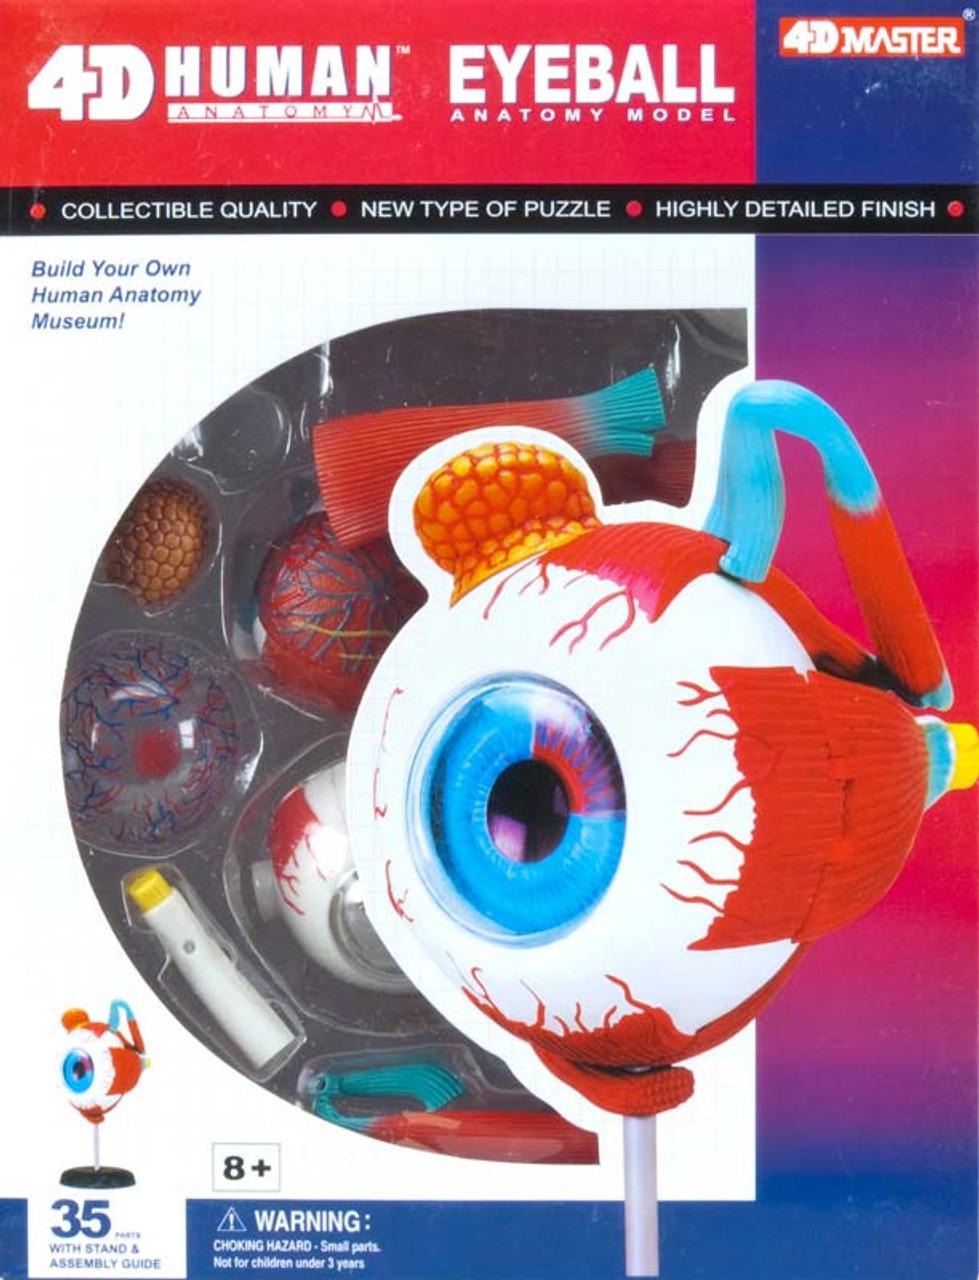 4d Human Eyeball Jigsaw Puzzle Seriouspuzzles